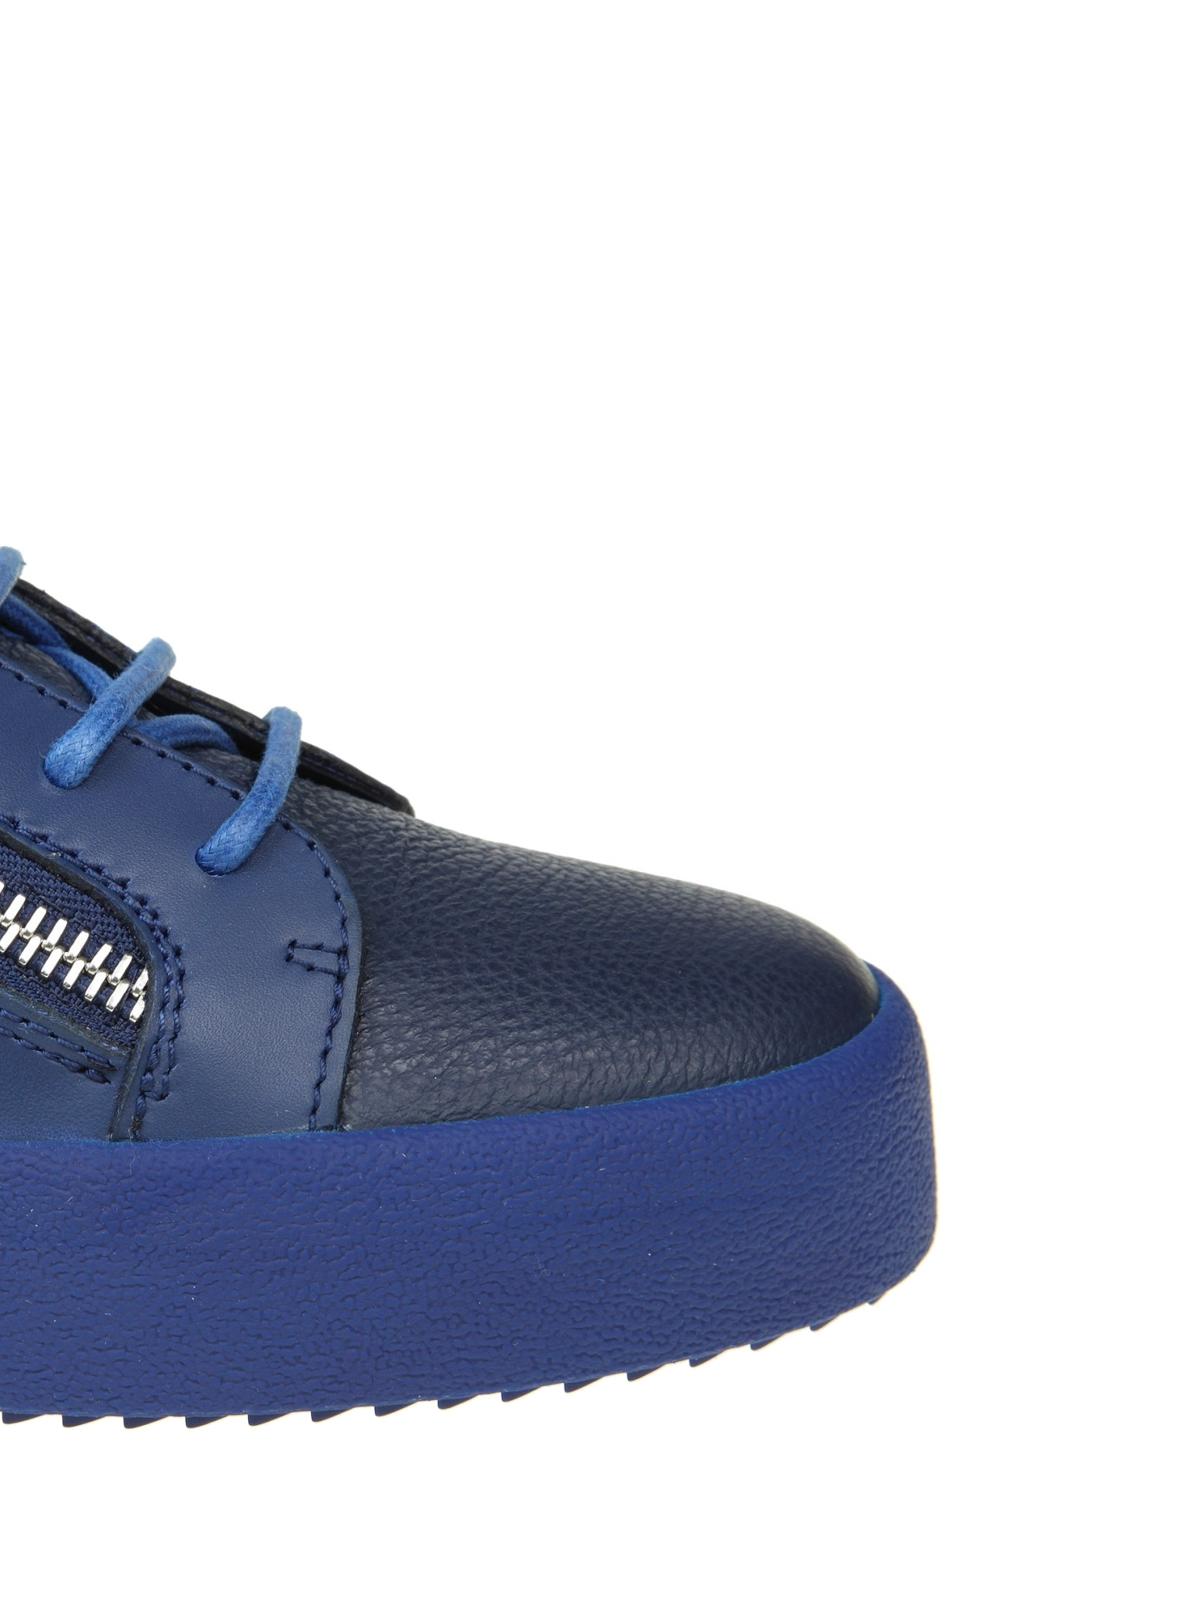 3bf07f7d5 iKRIX-giuseppe-zanotti-trainers-frankie-blue-leather-sneakers -00000130246f00s003.jpg